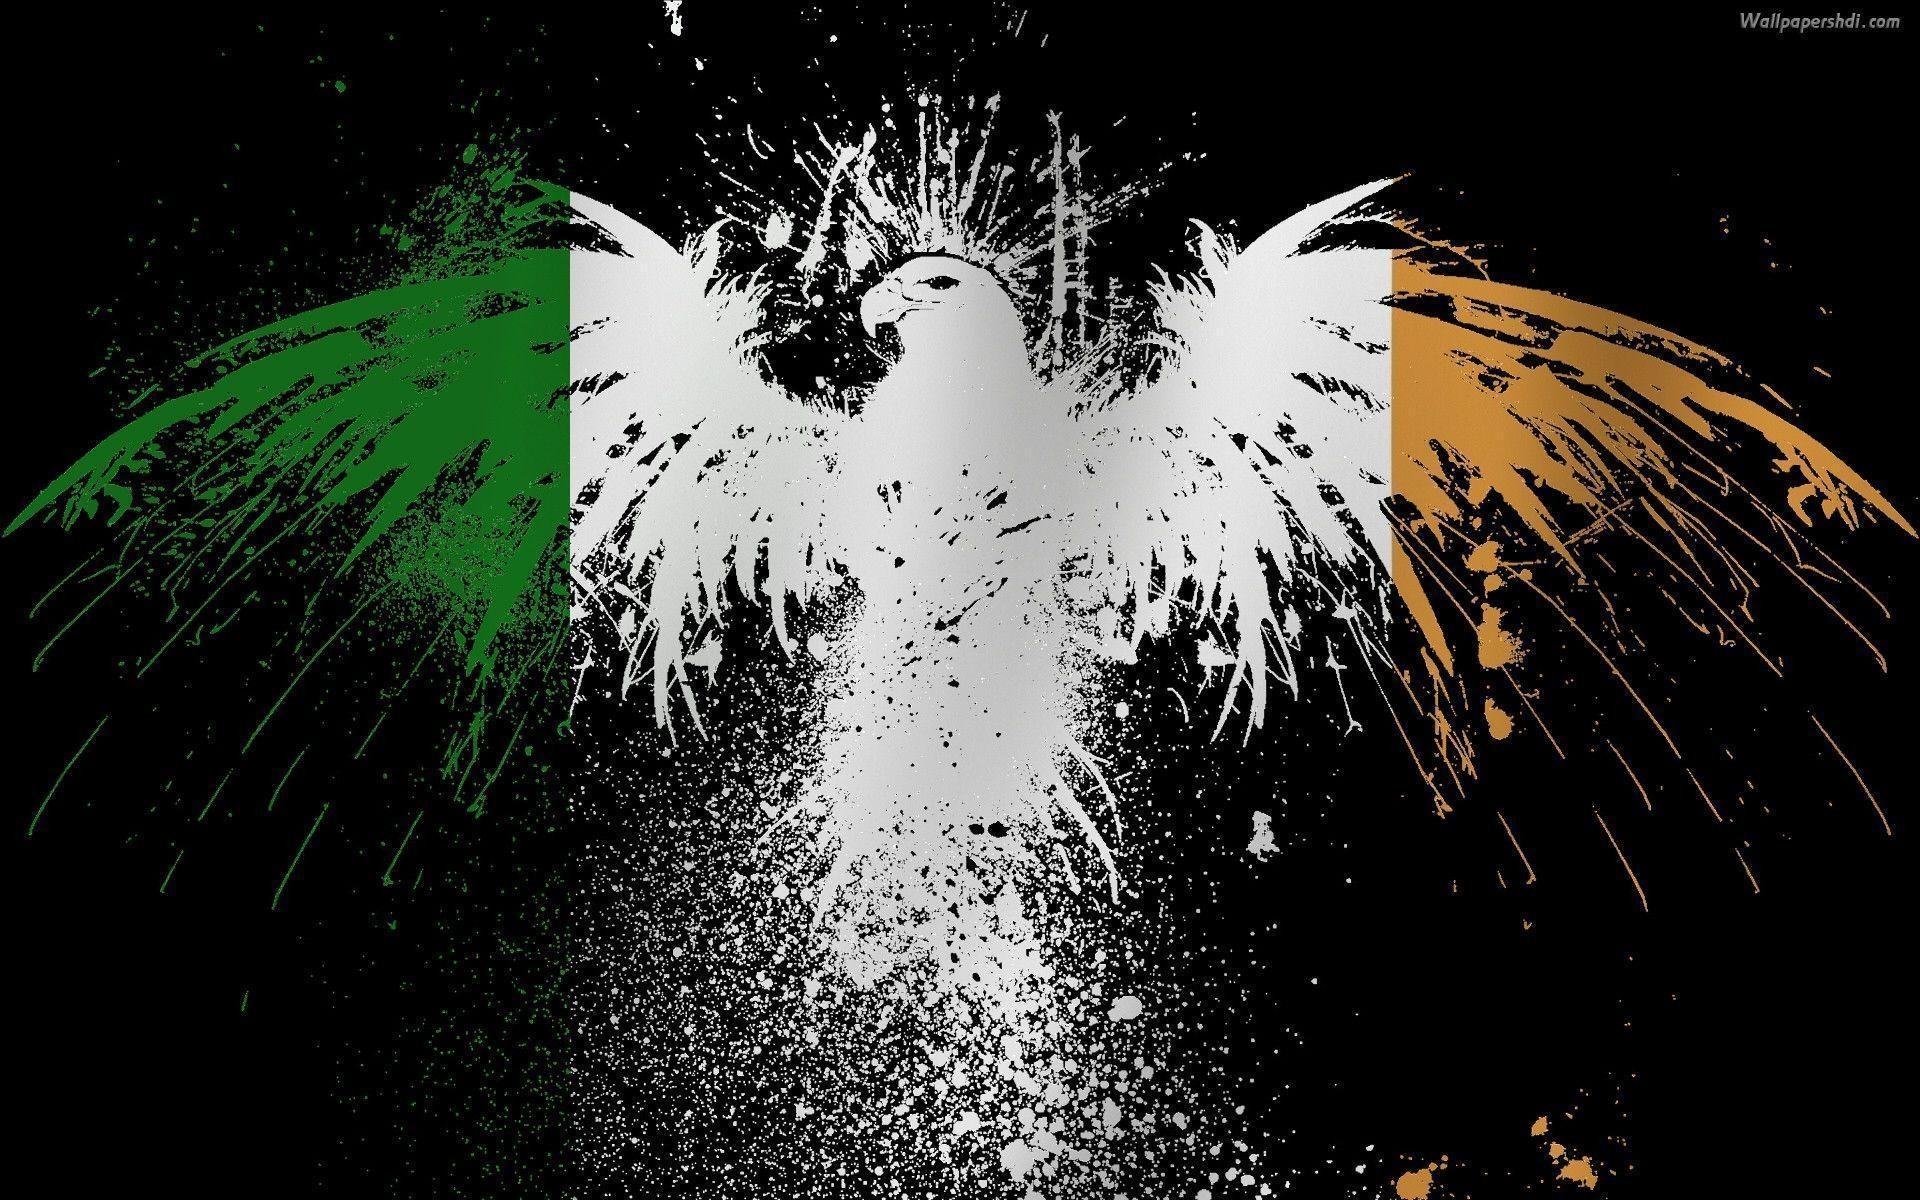 Irish Wallpaper Backgrounds  Cave